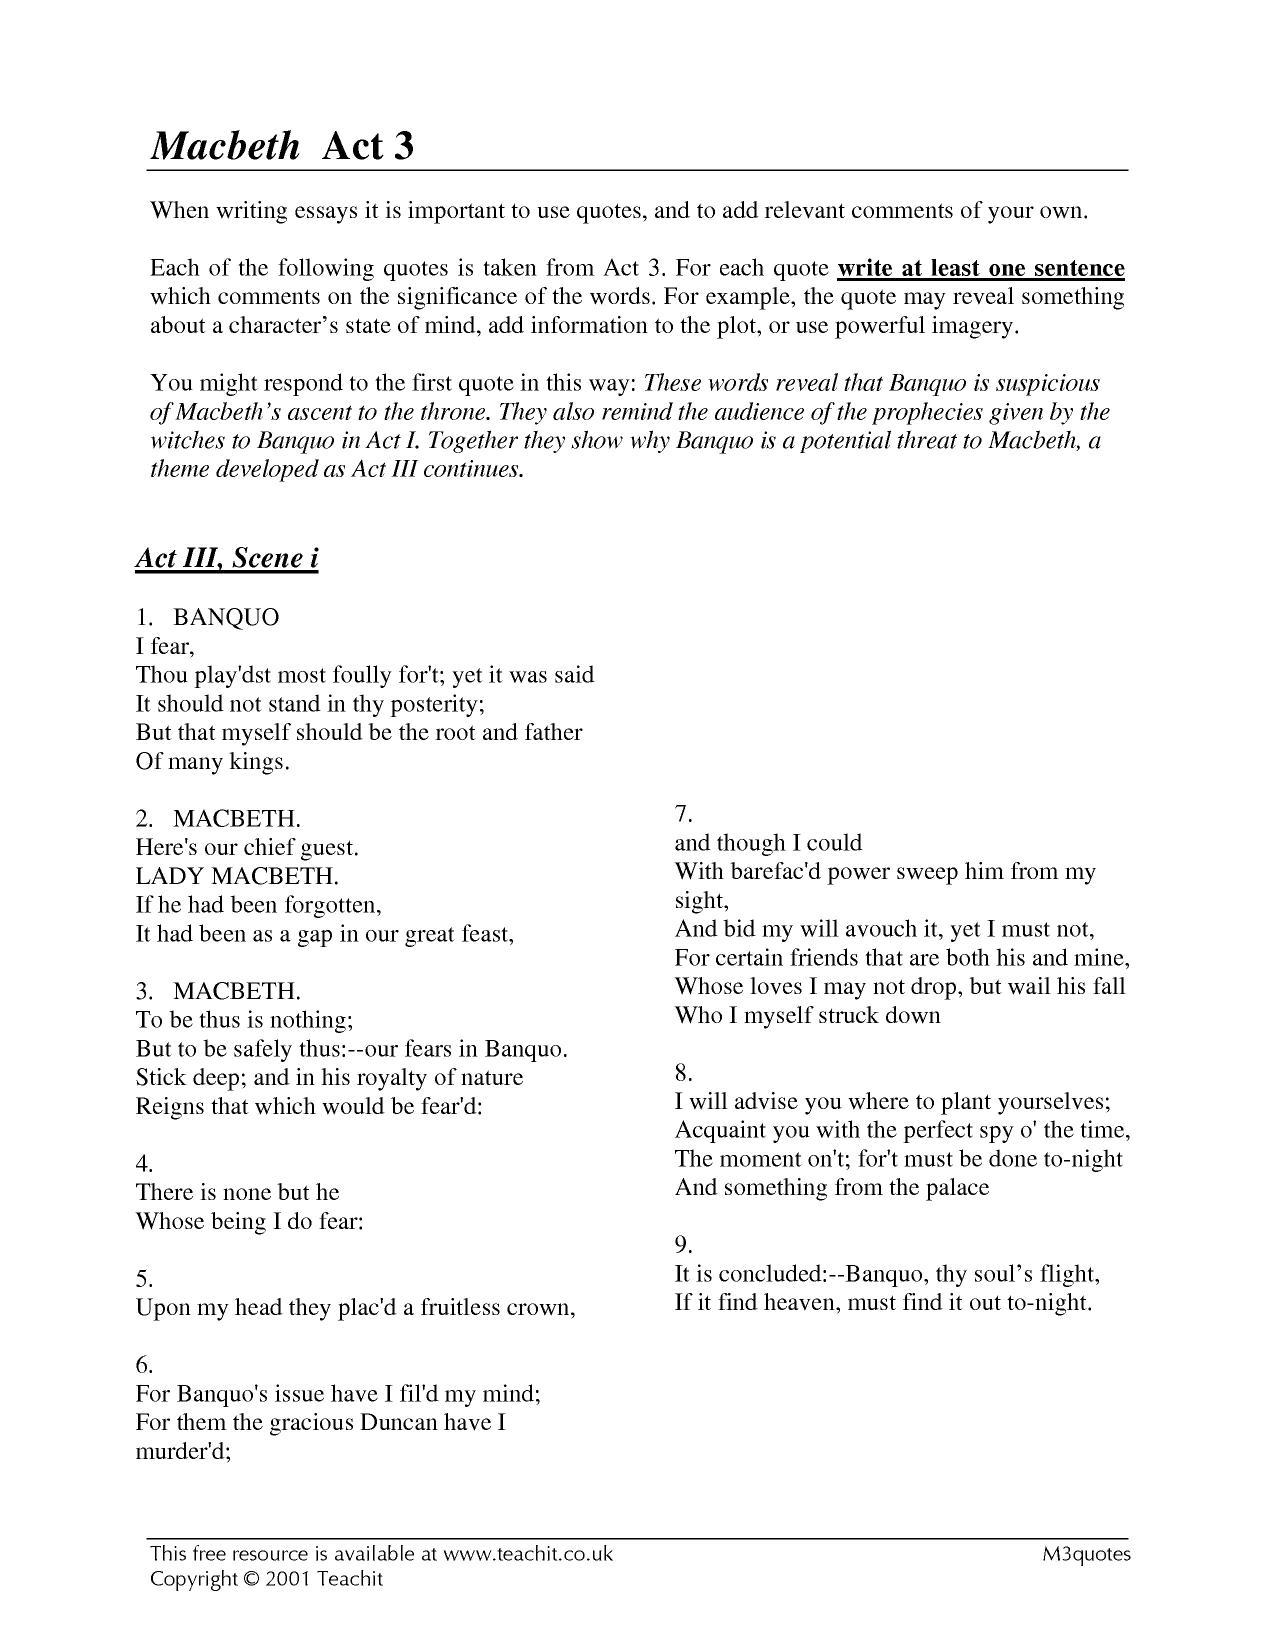 Essays on shakespeare's plays